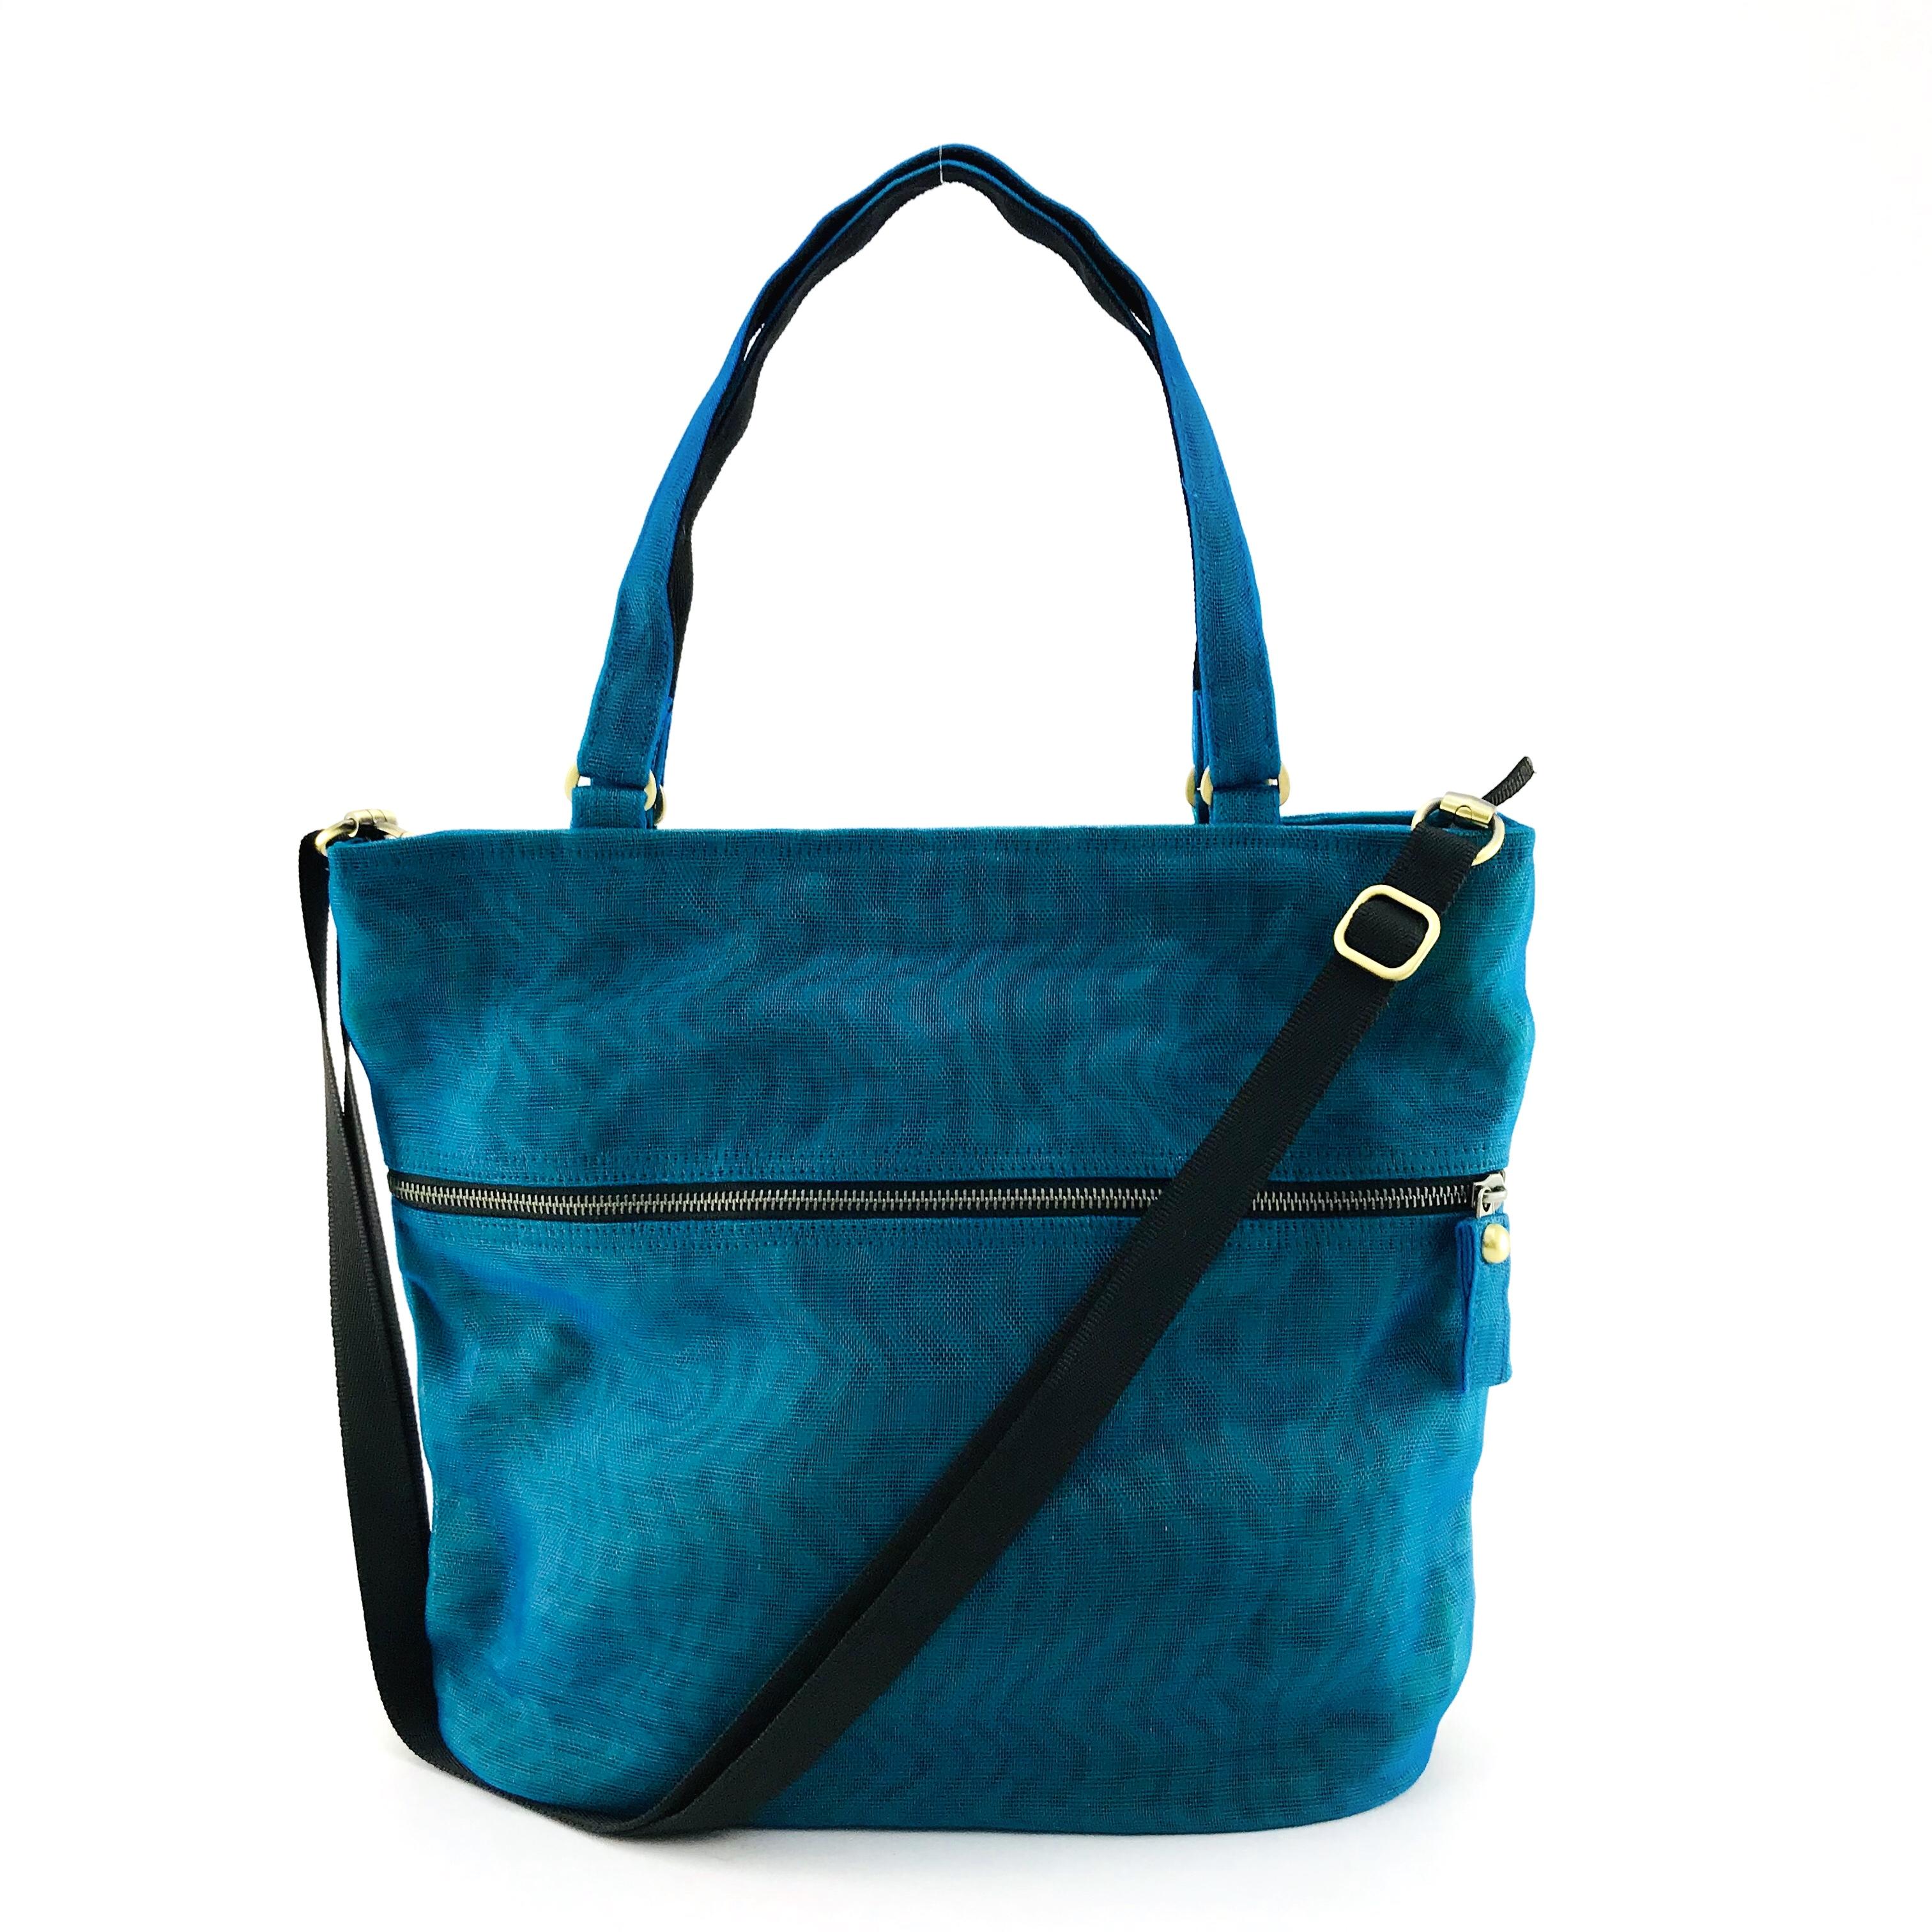 Drop - Ethical Handbag - Oil Blue